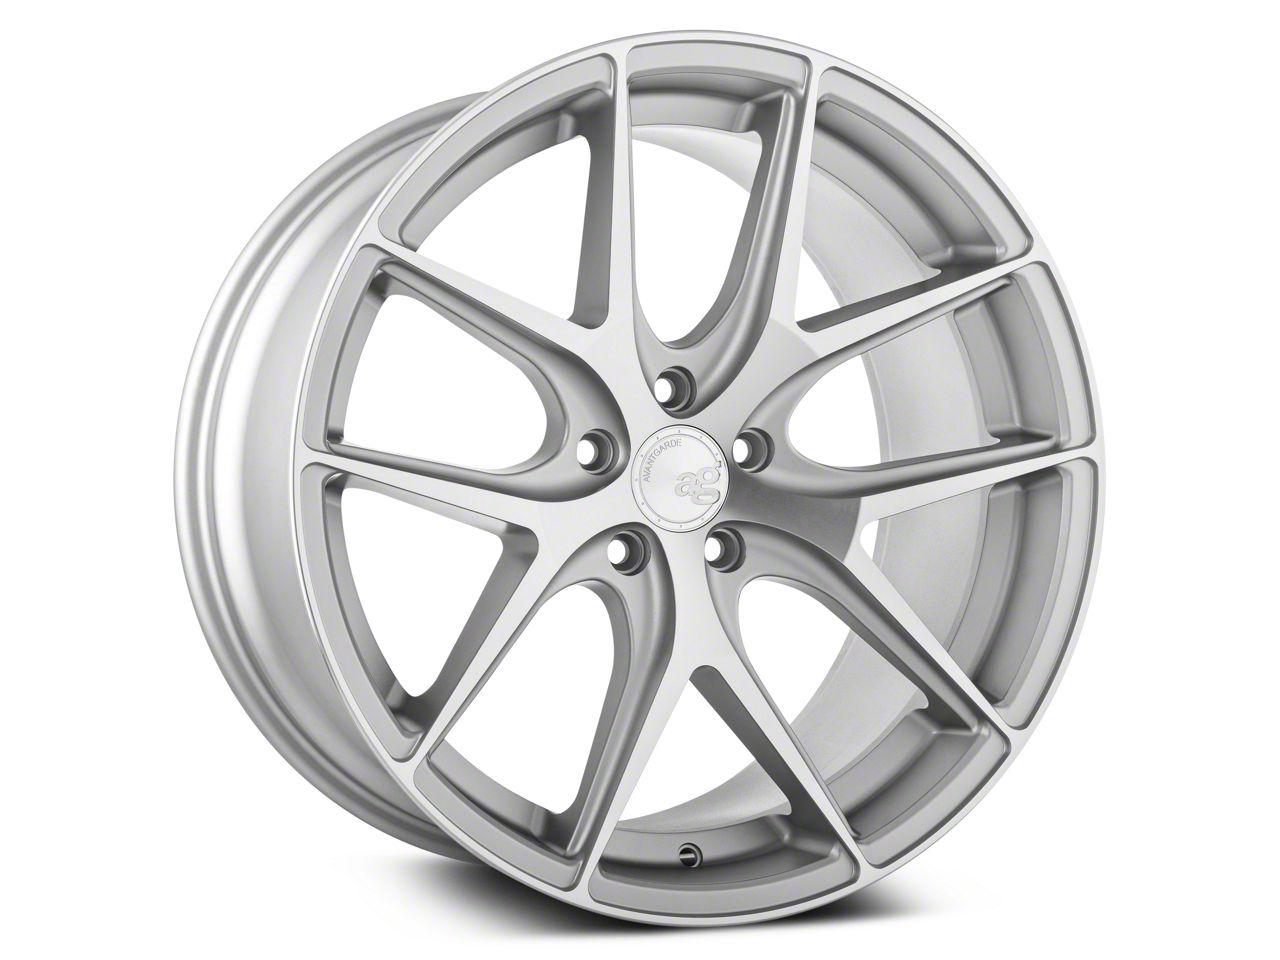 Avant Garde M580 Satin Silver Wheel - 20x10 - Rear Only (15-19 All)